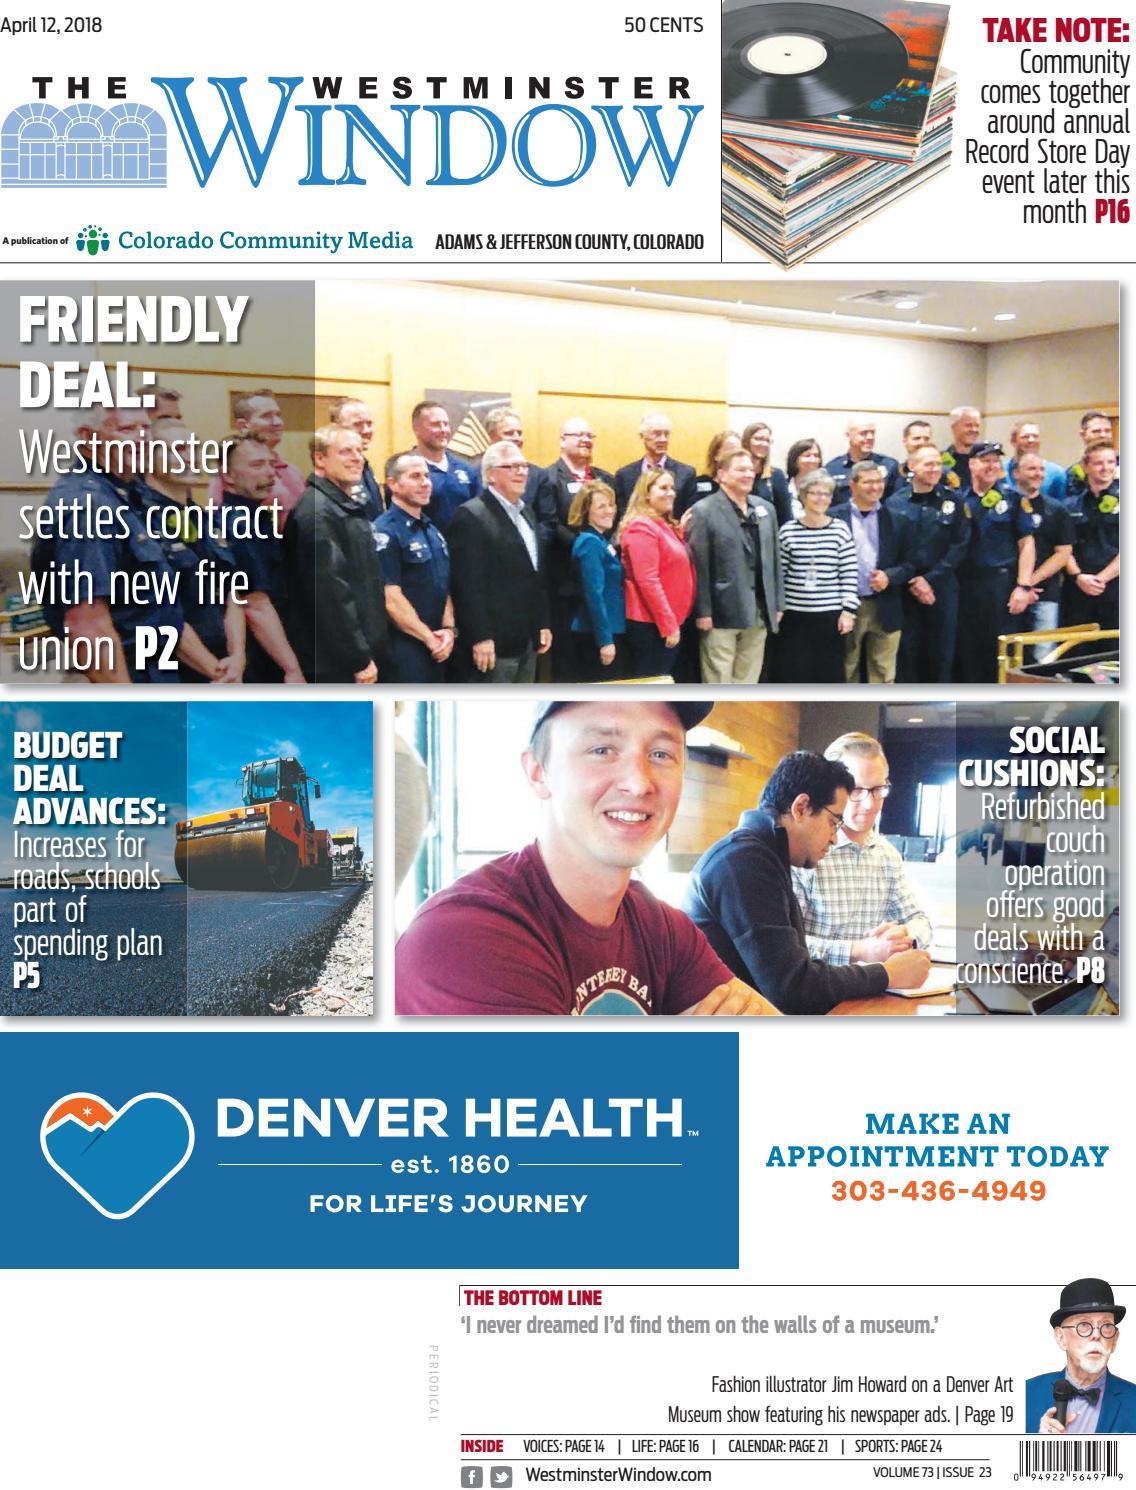 Westminster Window 0412 by Colorado Community Media - issuu